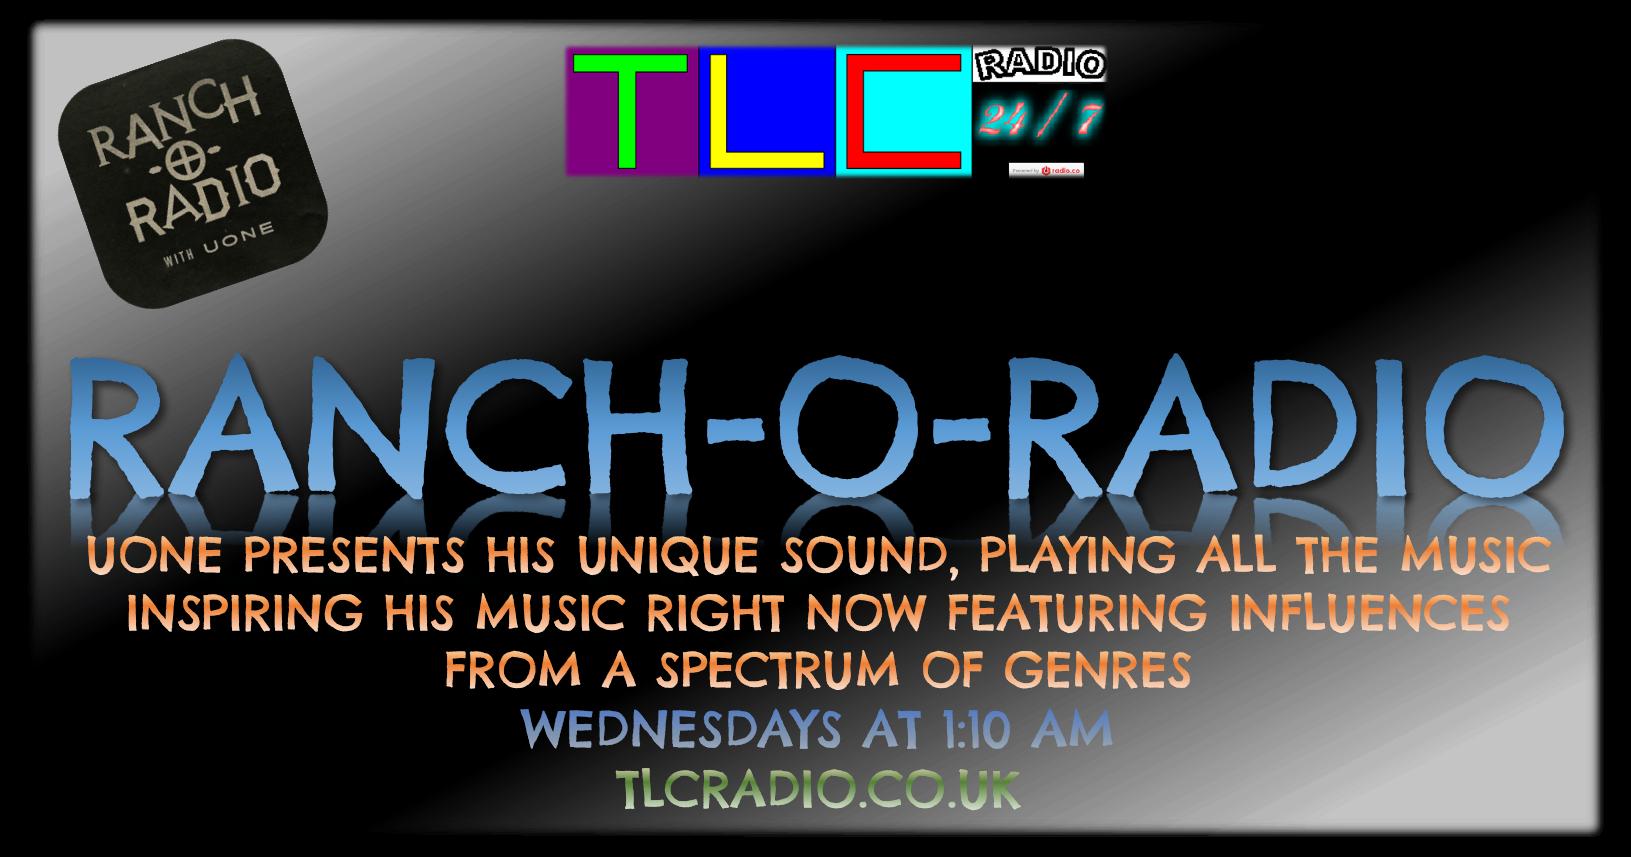 Ranch-O-Radio